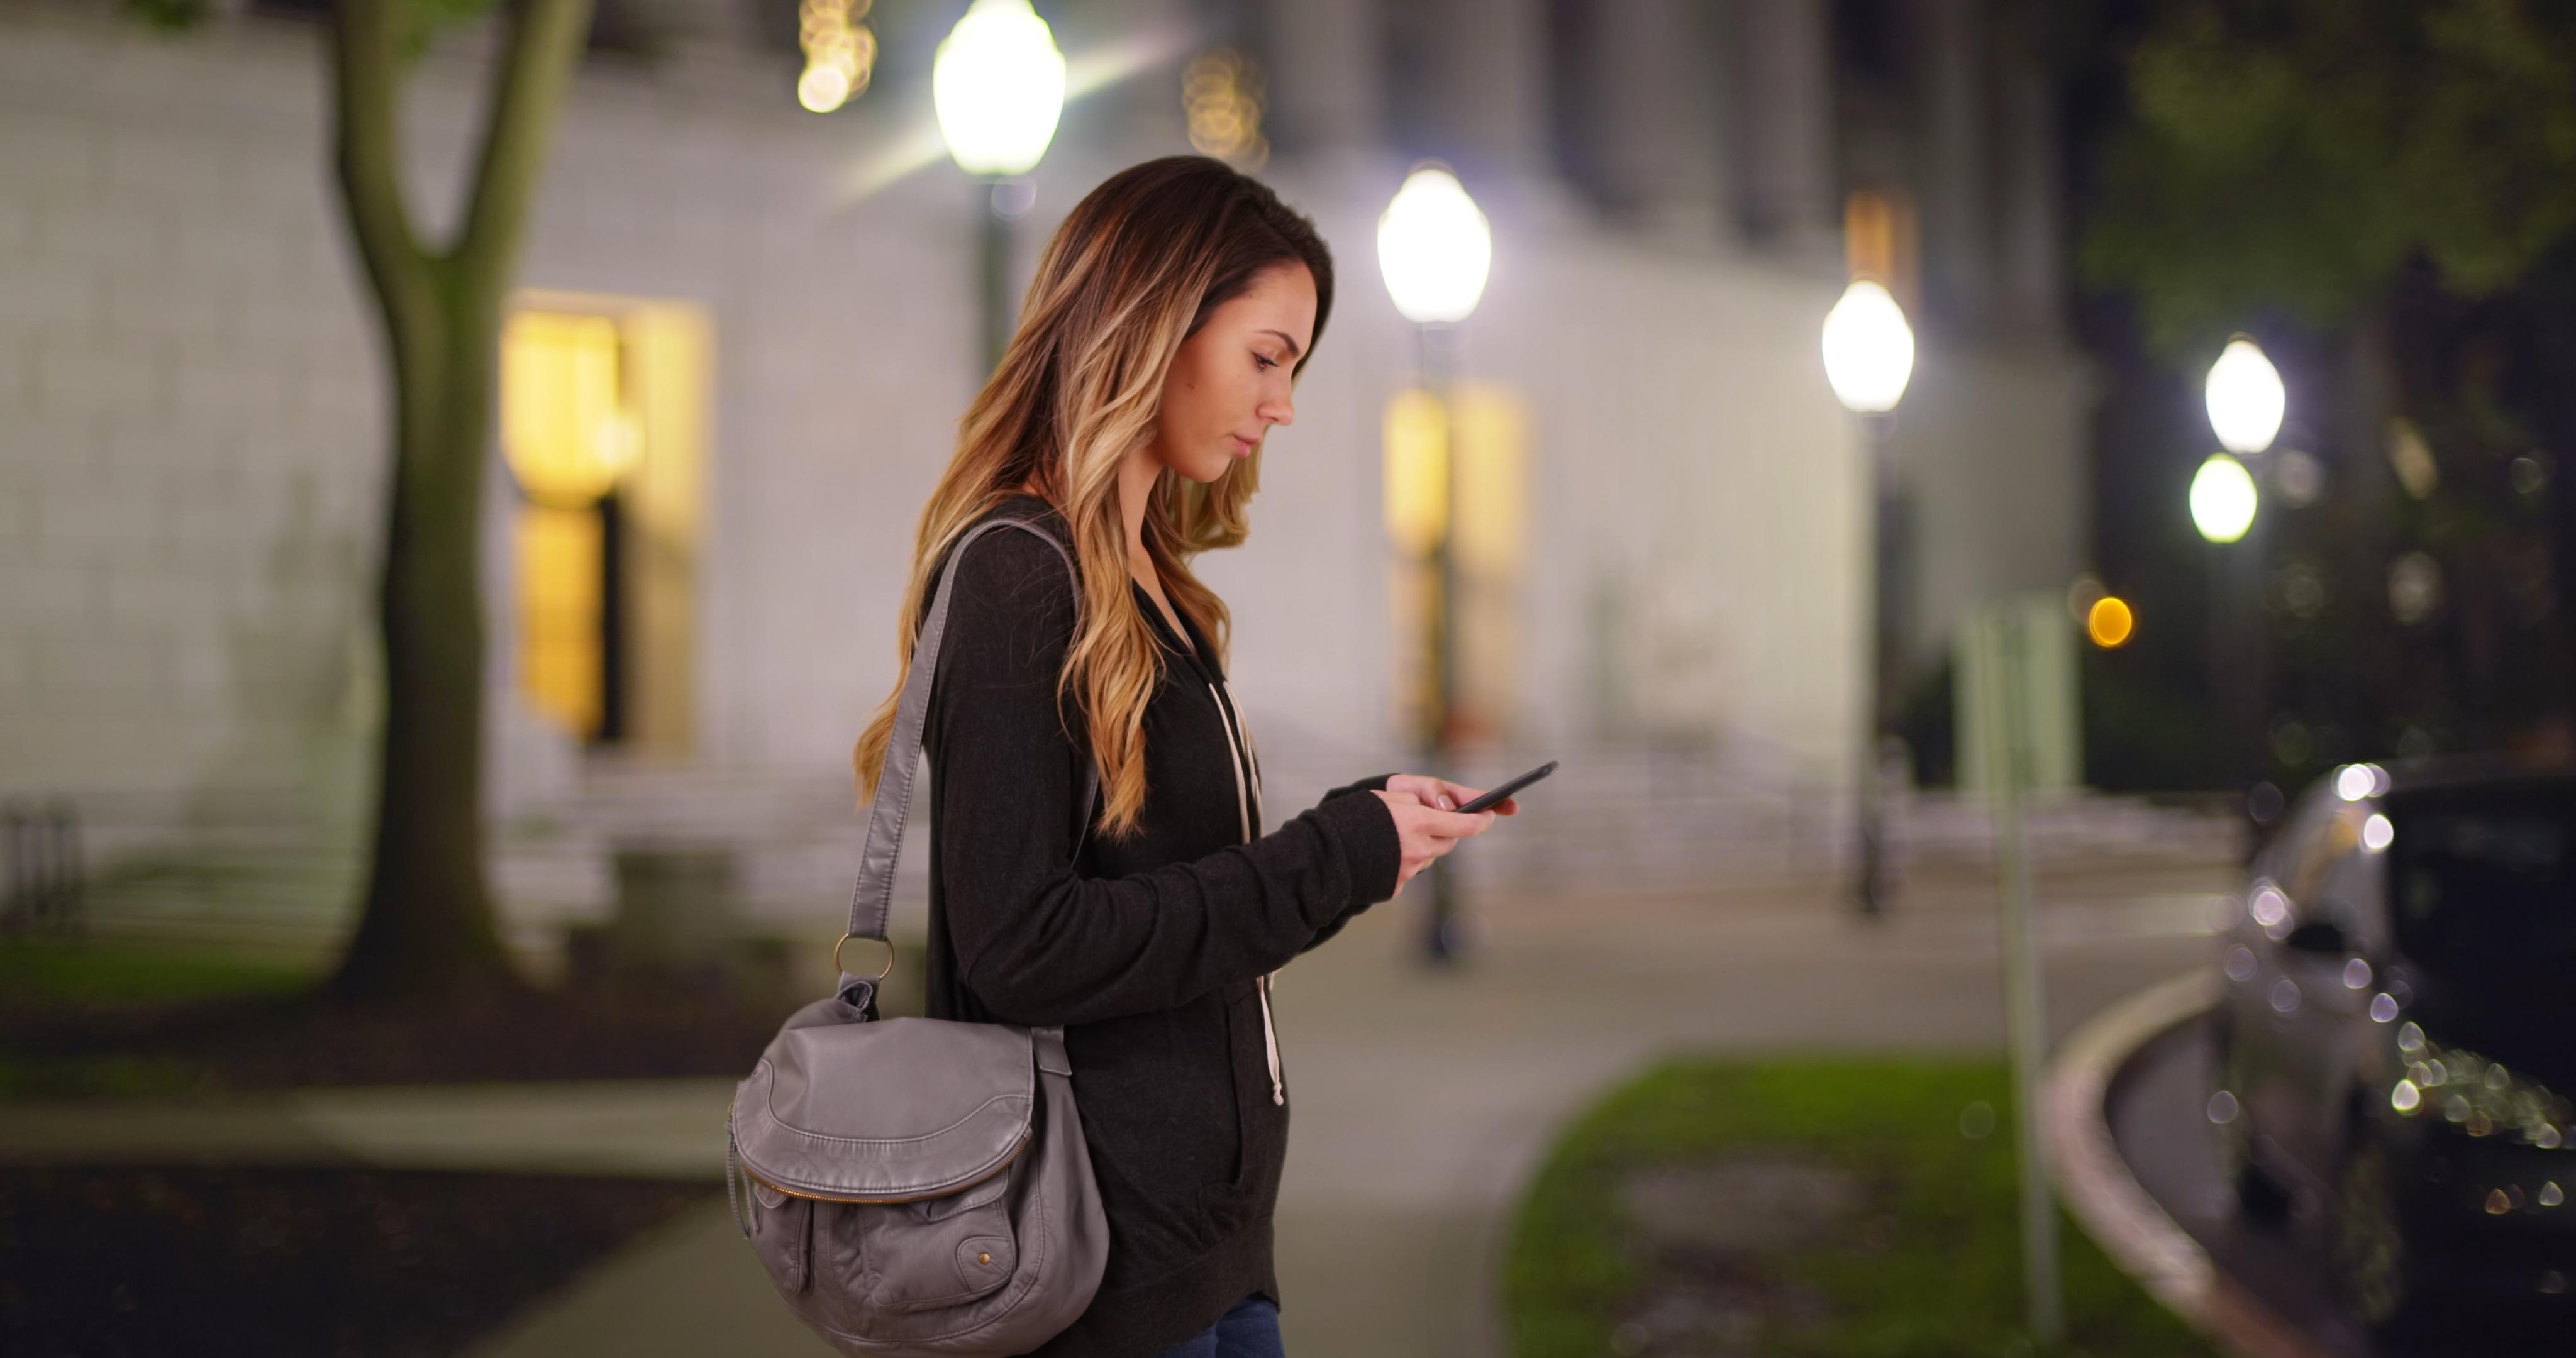 Girl walking on campus checking her phone